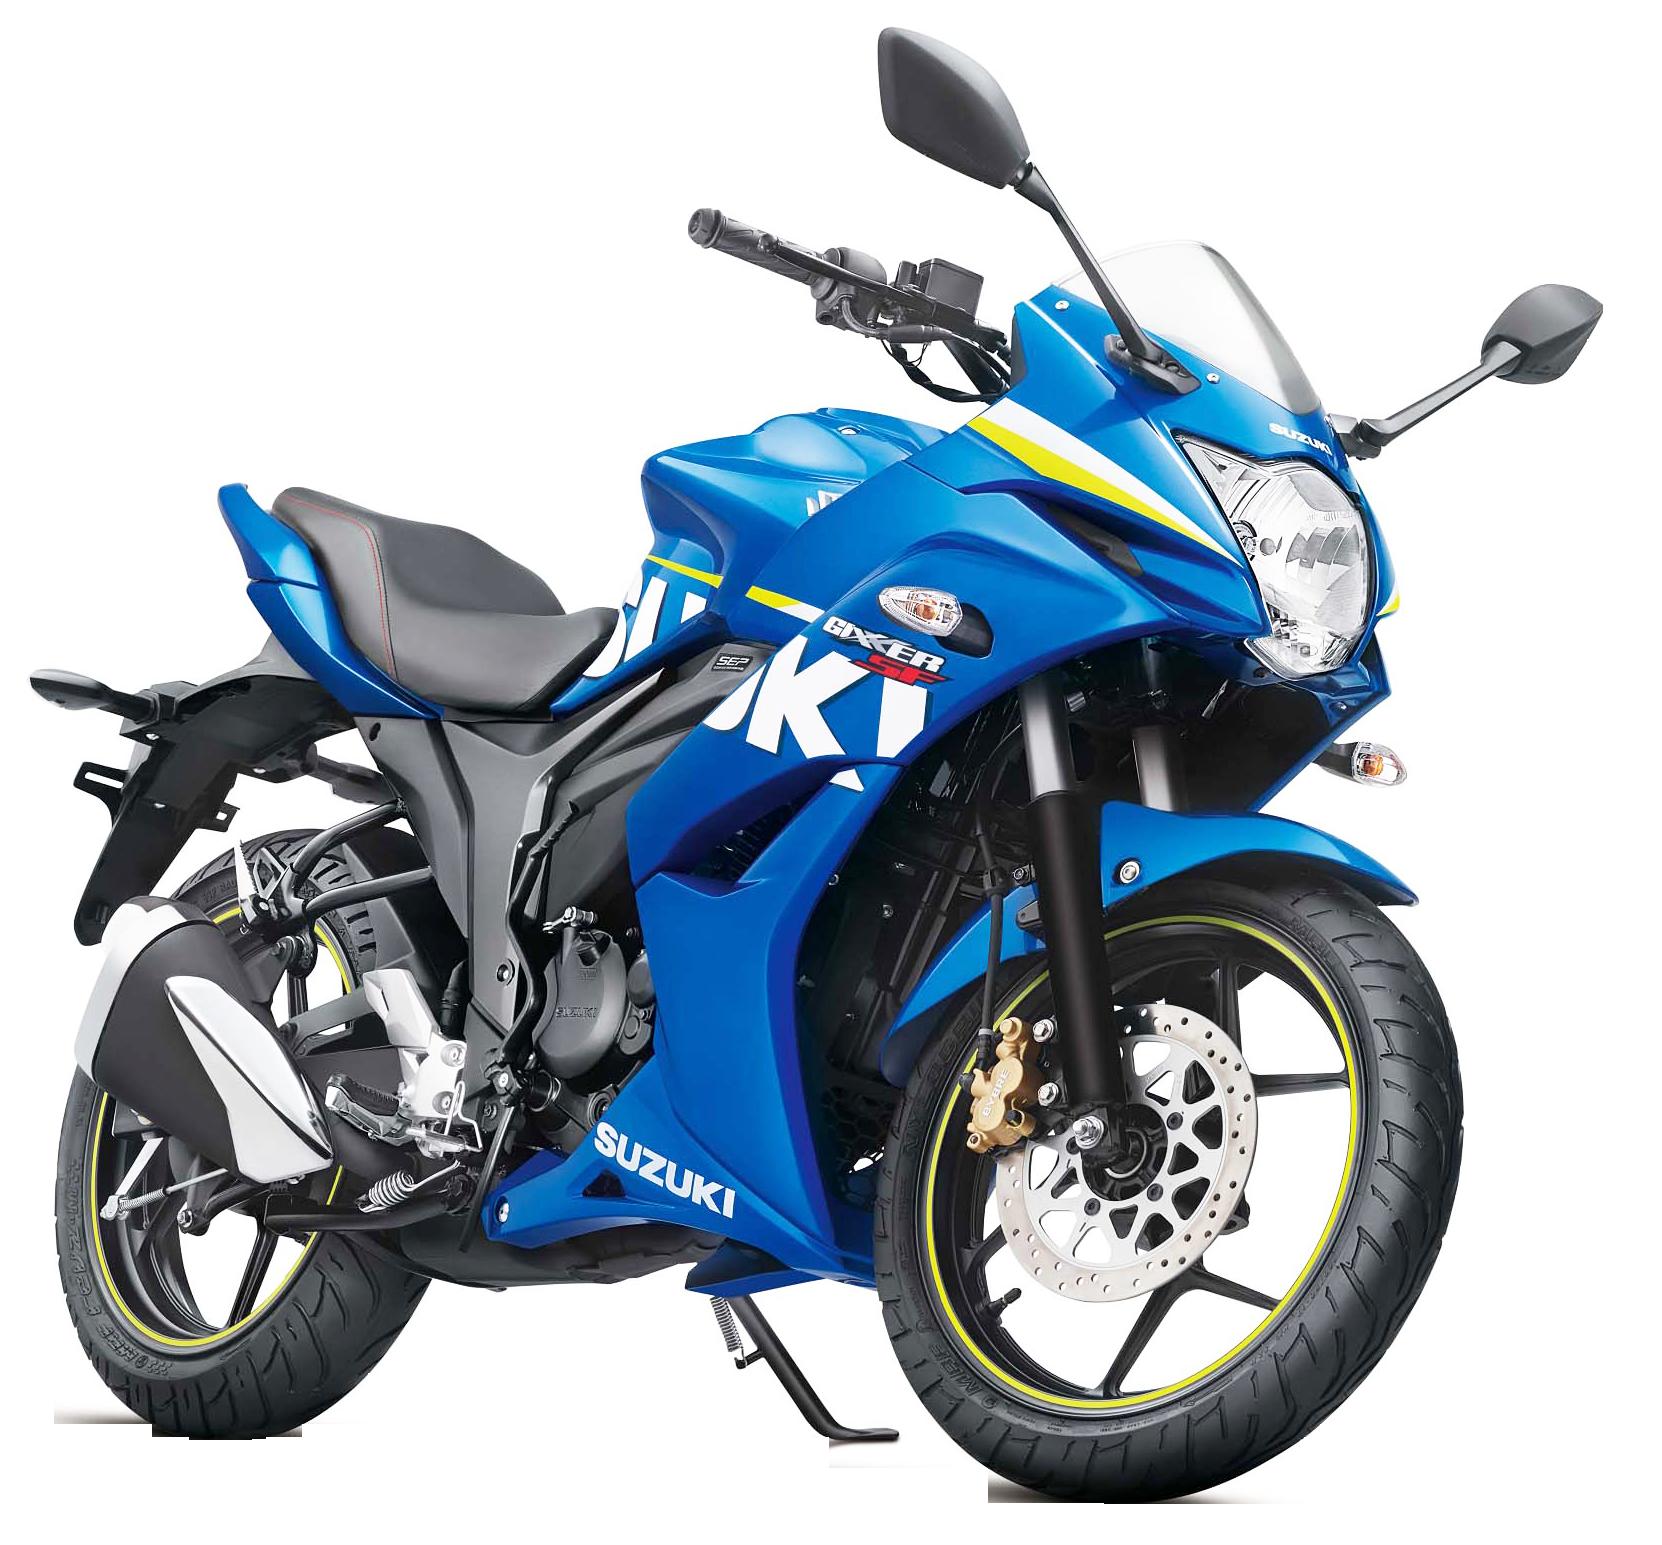 Motorbike HD PNG - 90553